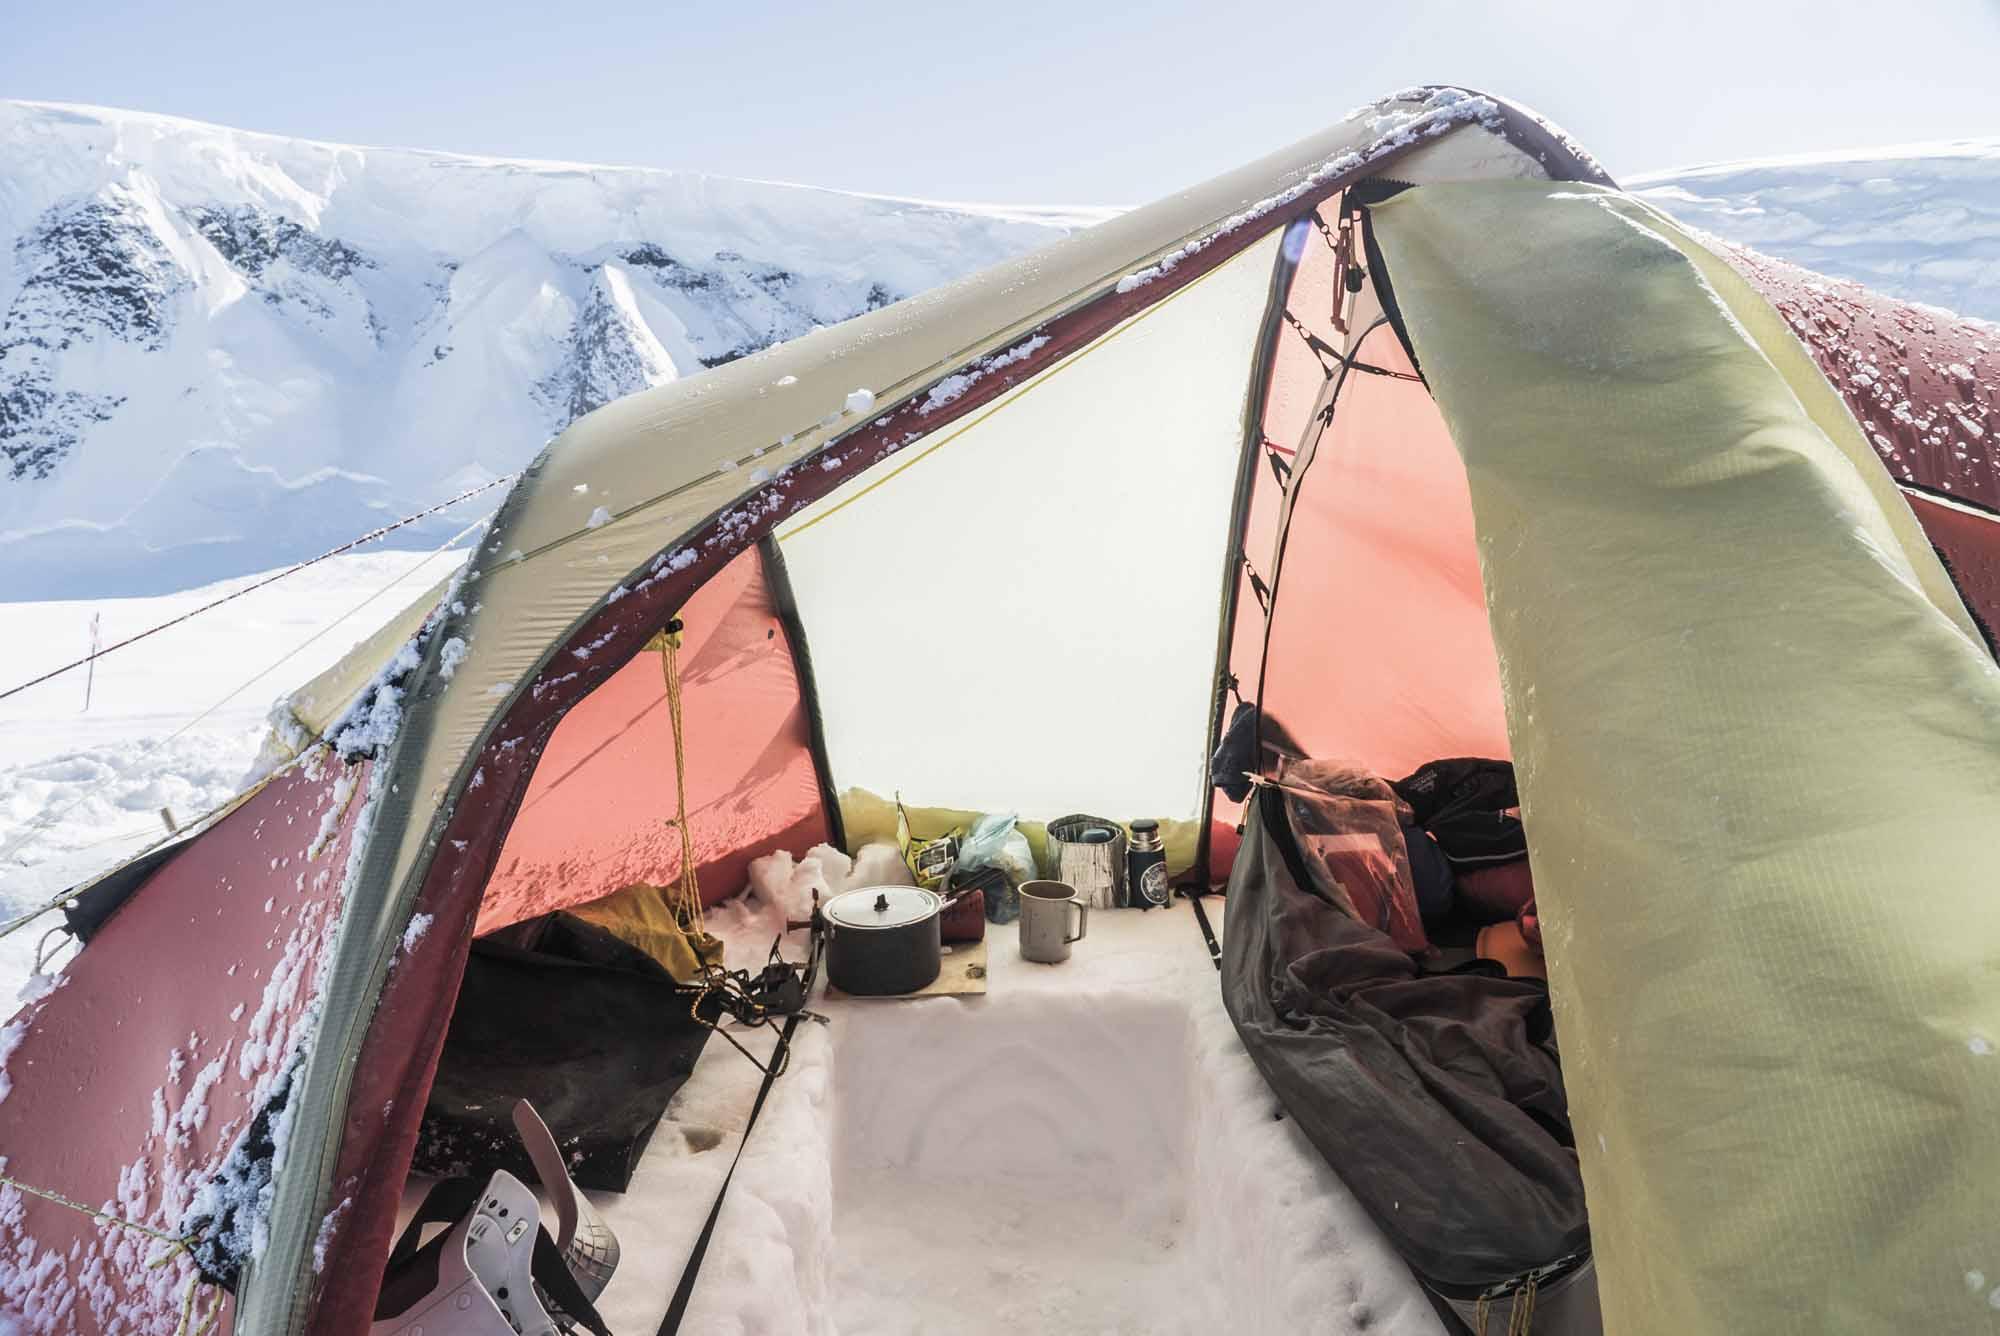 Polar-Quest-Exploration-Polaire-Exploring-Boundaries-in-Antarctica-Caroline-Cote-photo-mess-tent